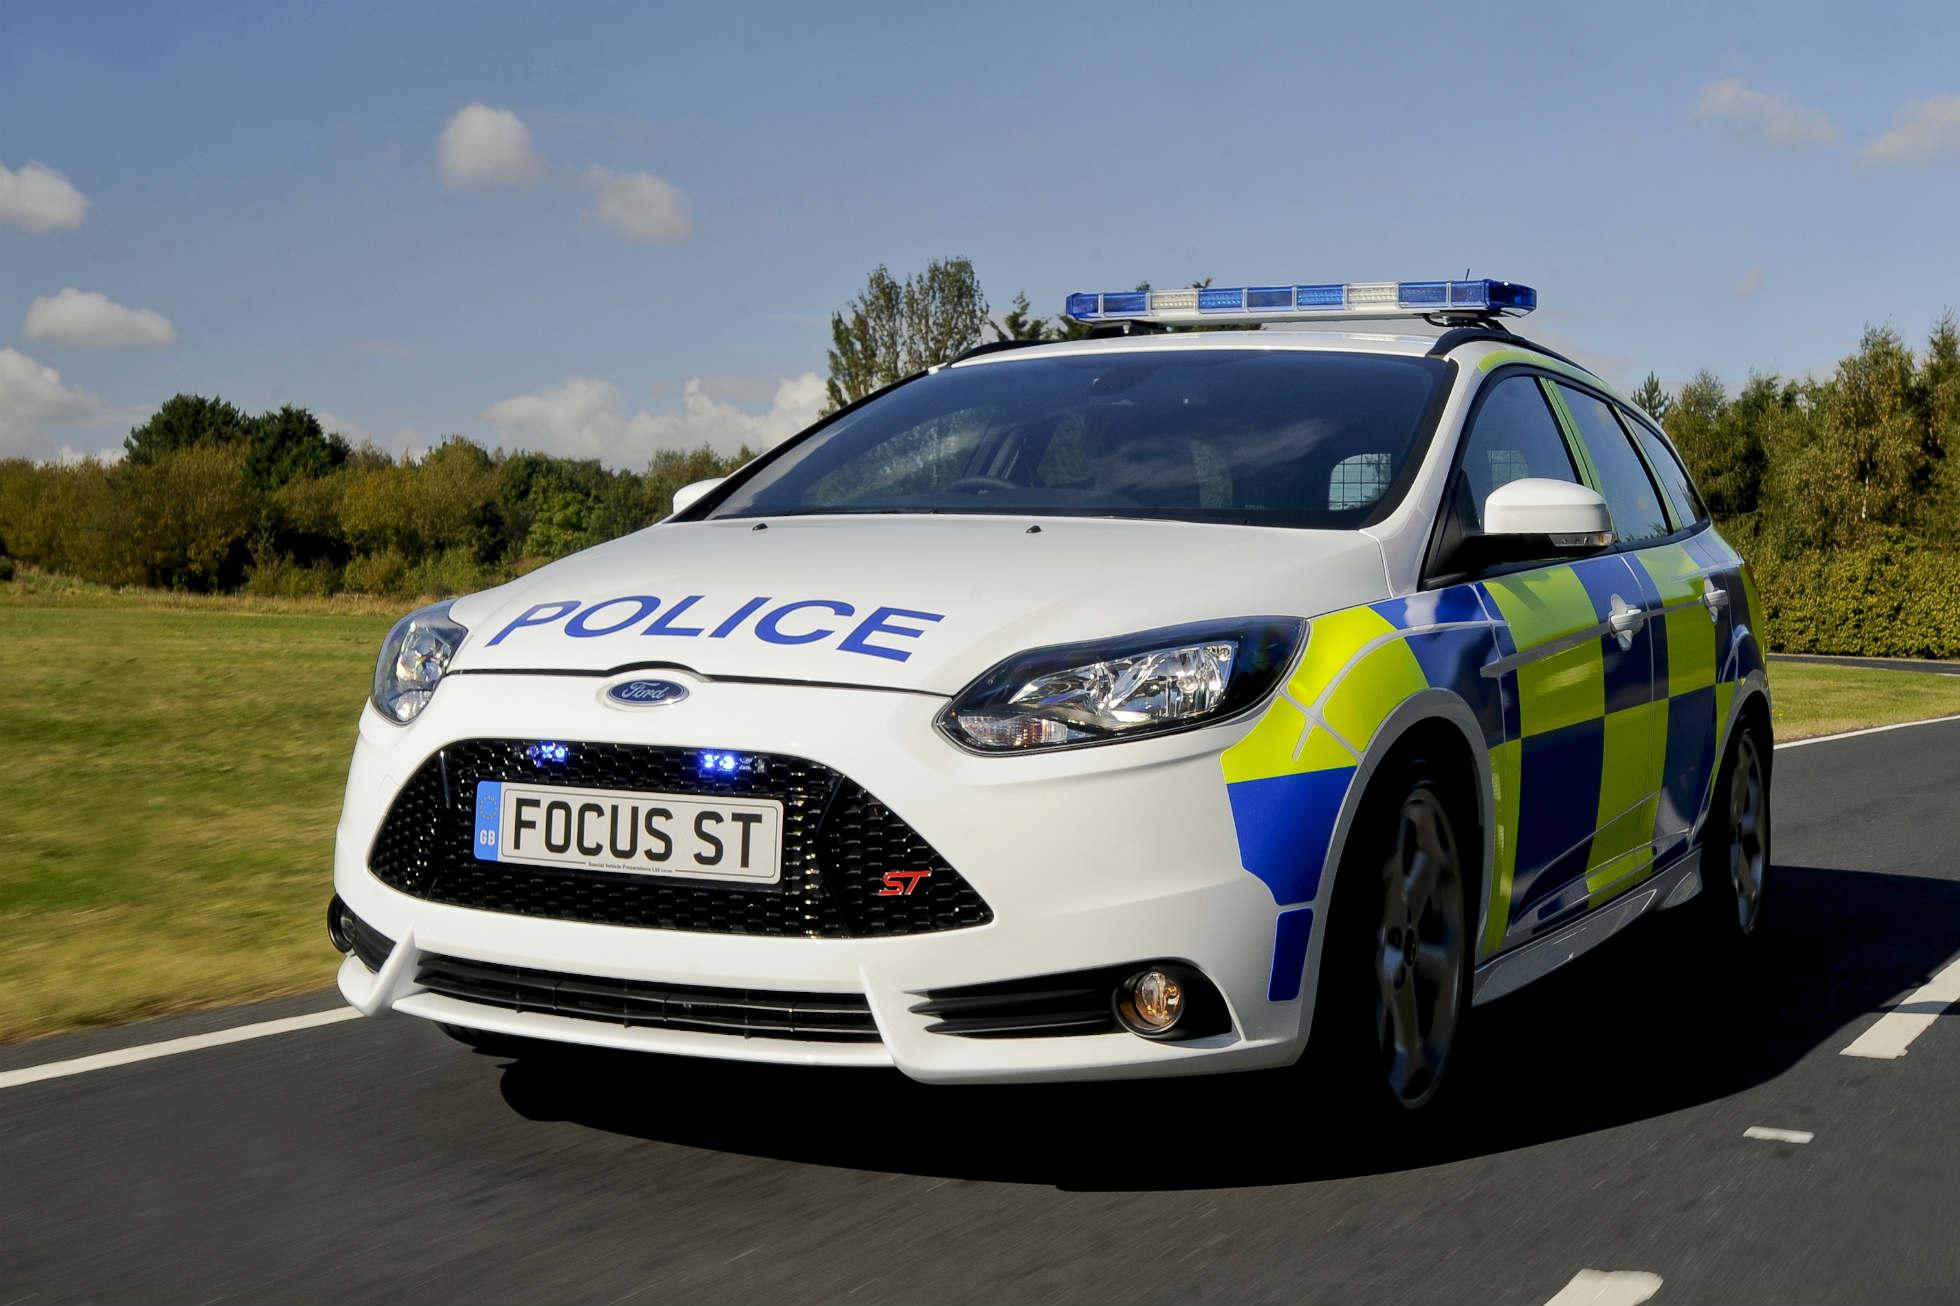 Speeding traffic cops caught on camera at 130mph